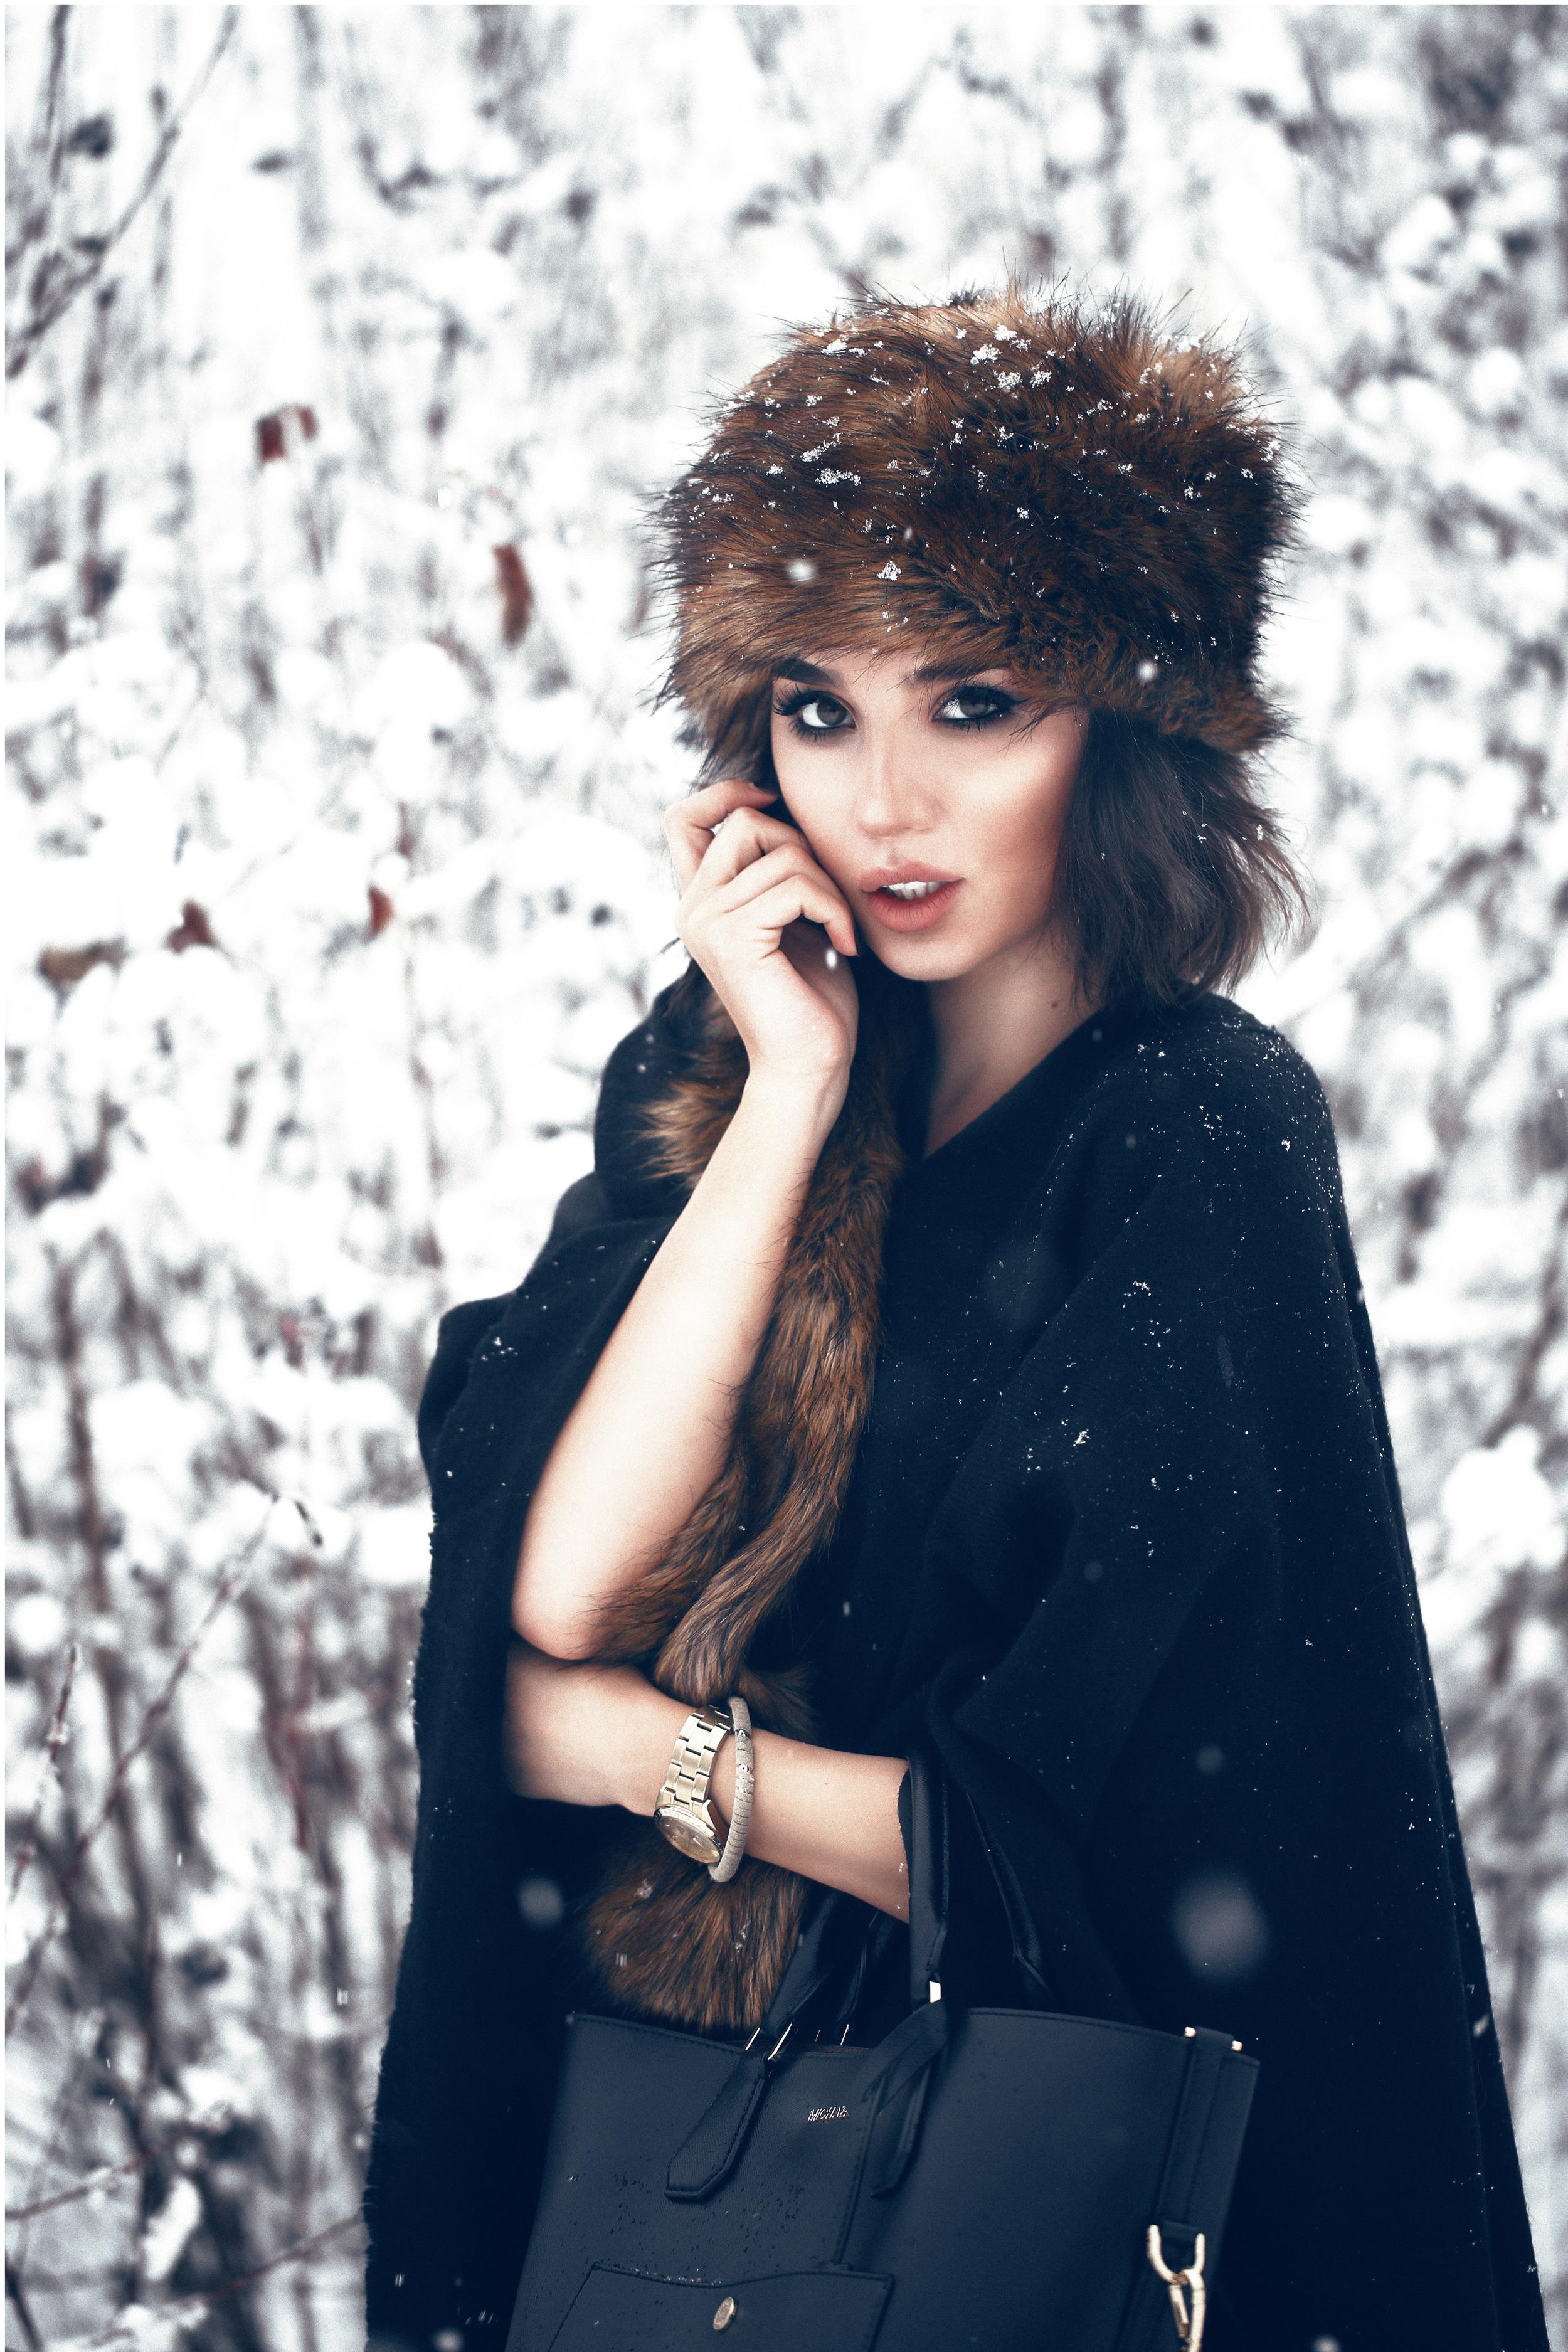 x2 Diana Rogo from Dyrogue.jpg